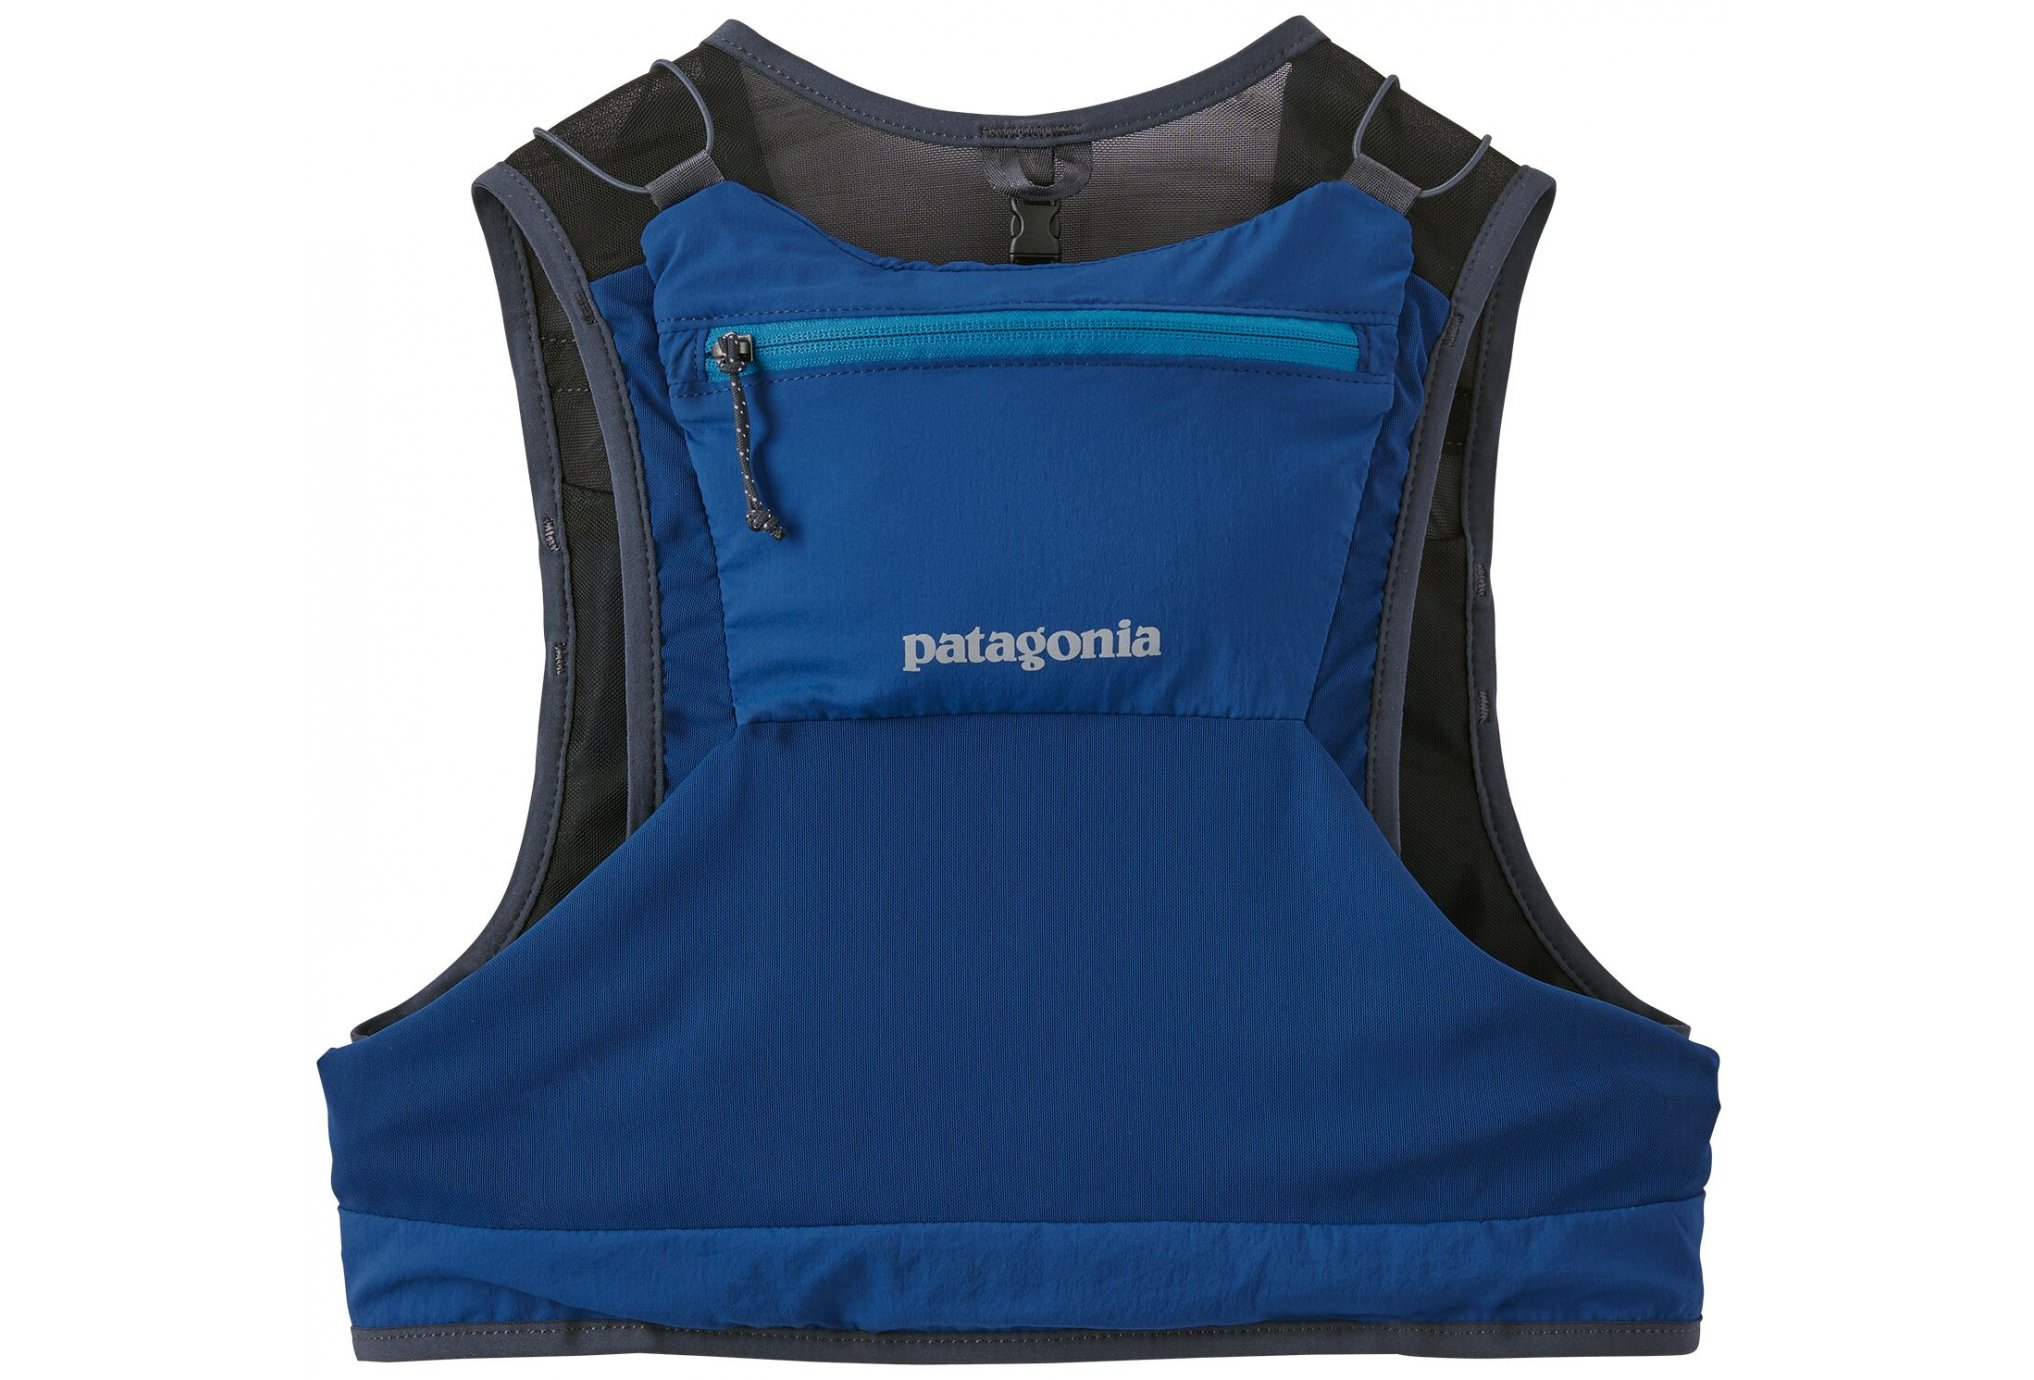 Patagonia Slope Runner Endurance 3L Sac hydratation / Gourde